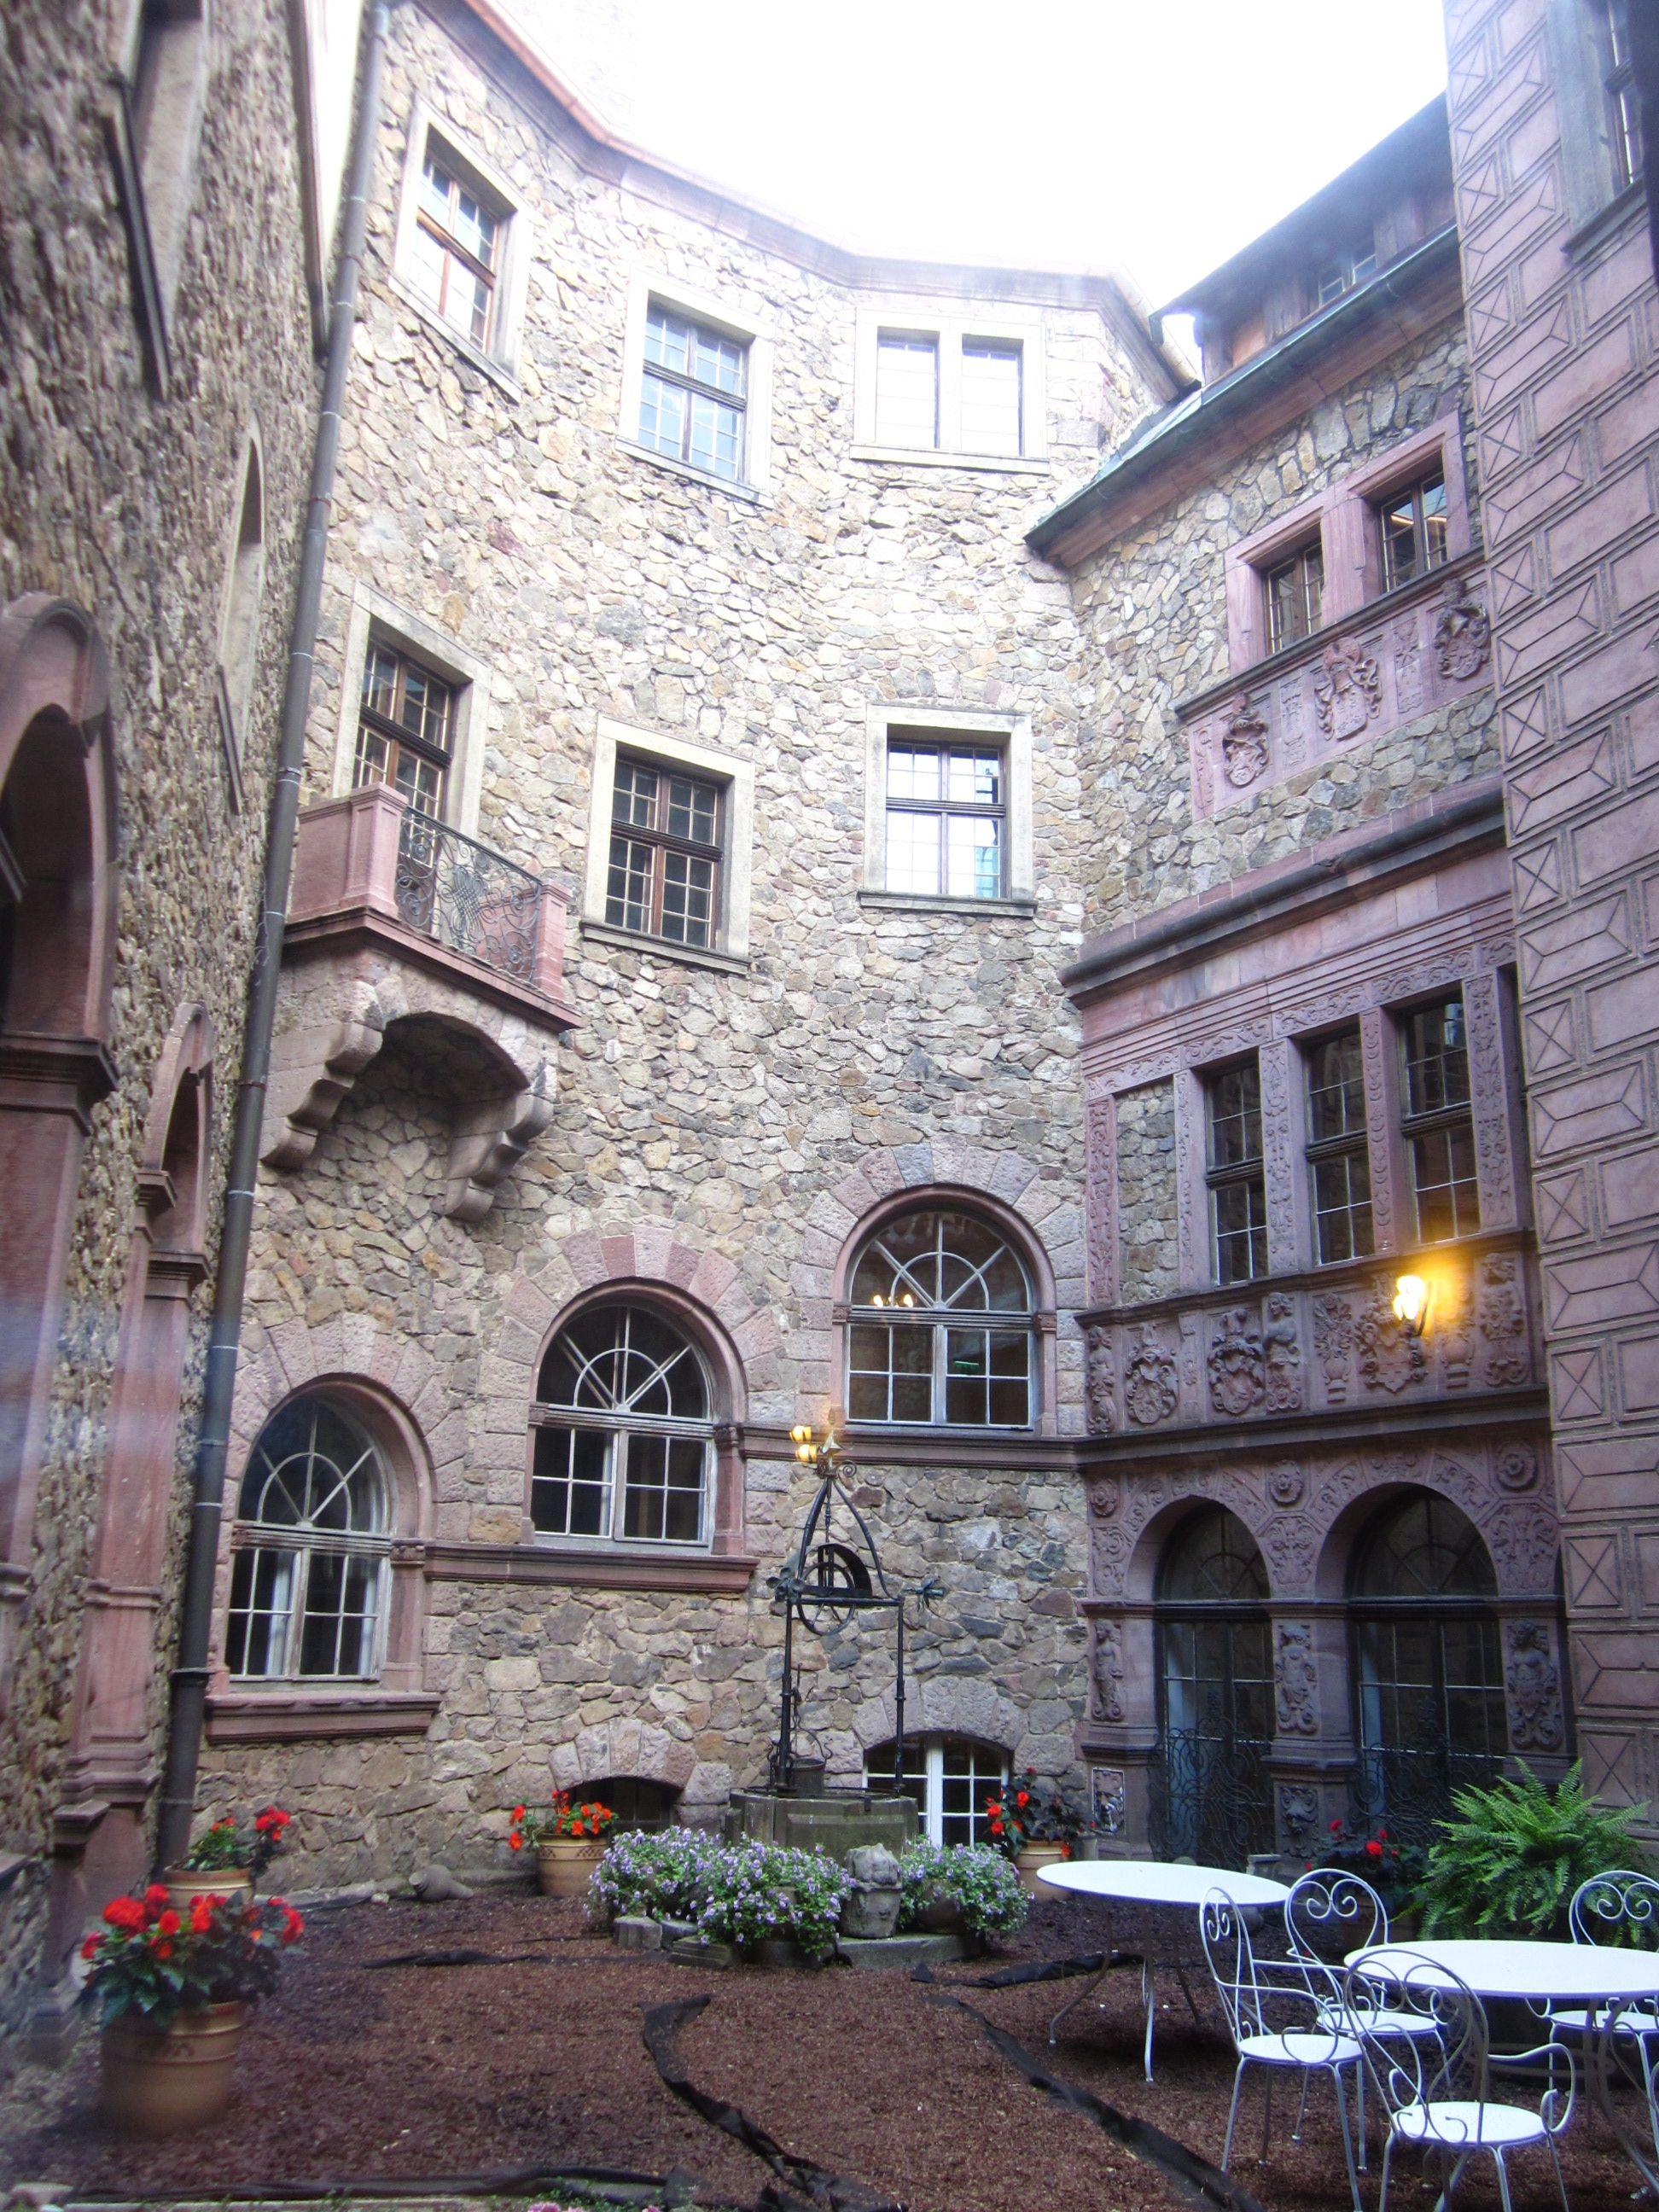 One of the inner courtyards in Castle Książ